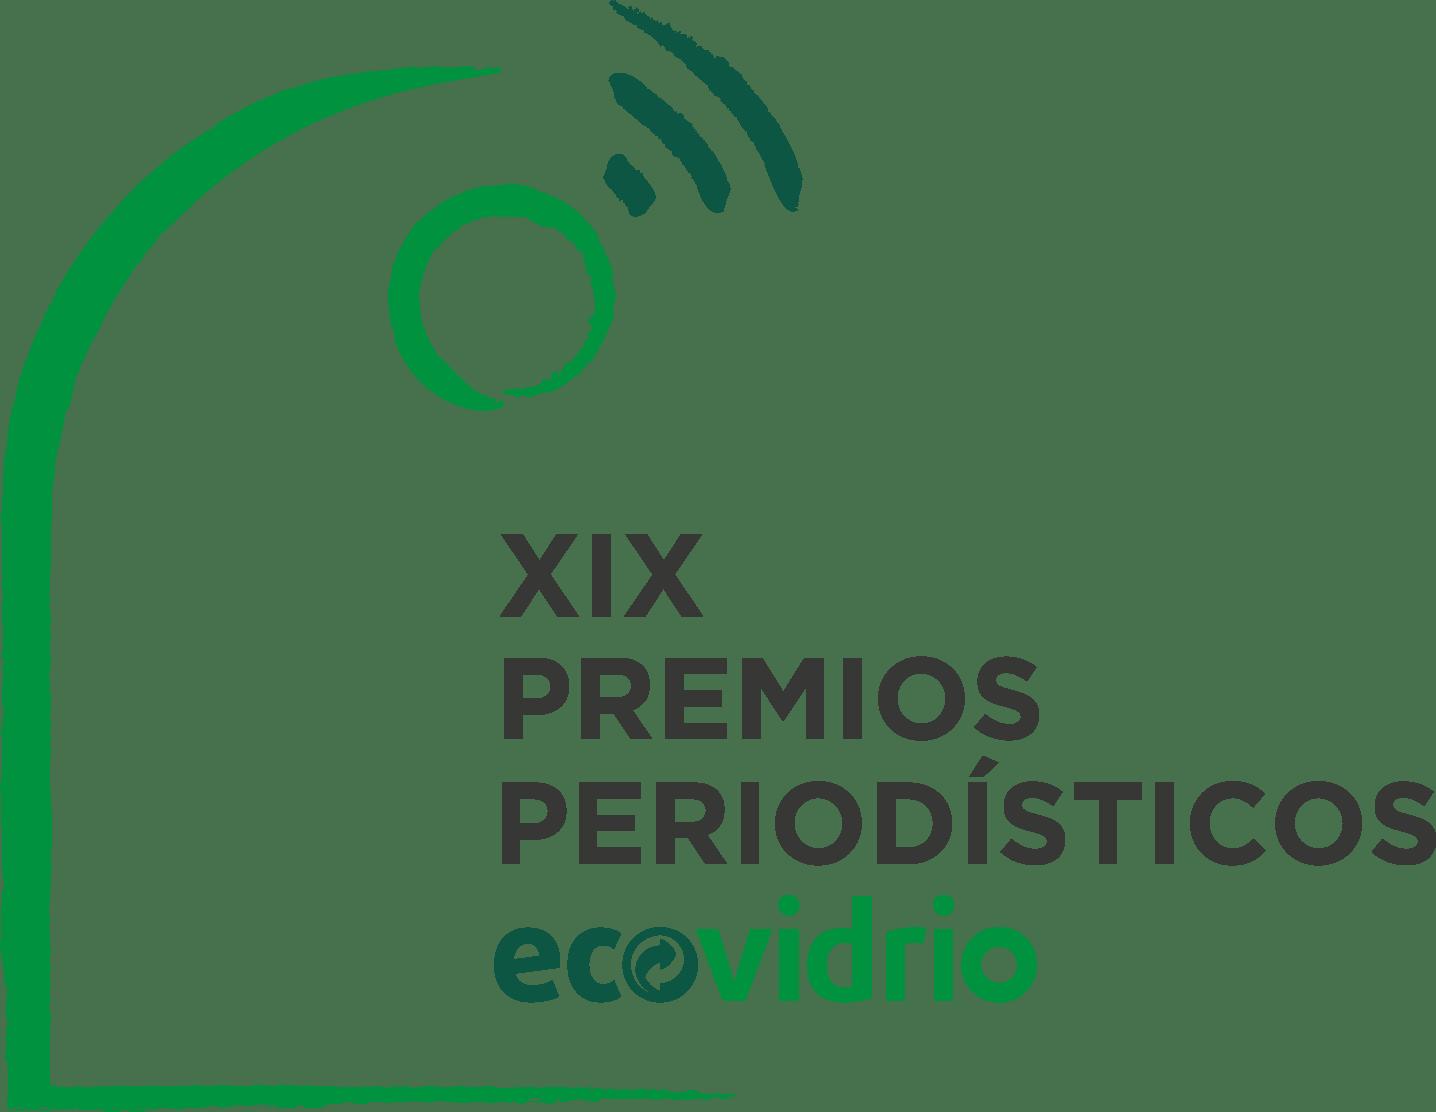 Logo XIX premios periodisticos